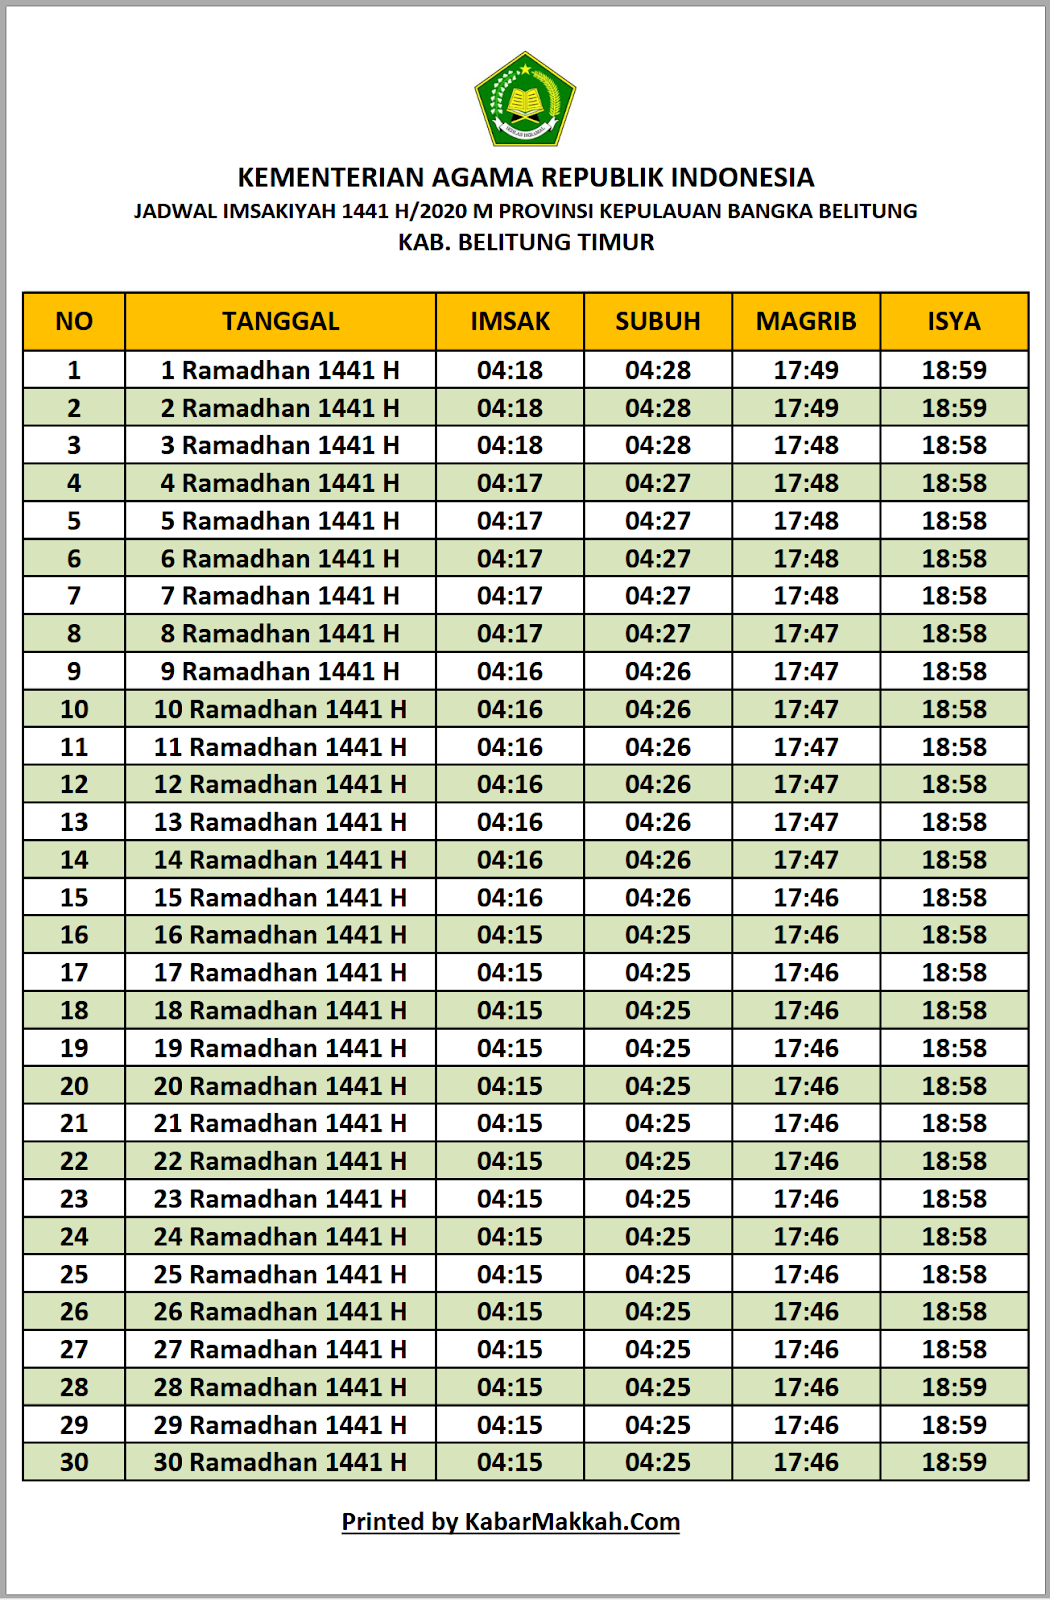 Jadwal Imsakiyah Belitung Timur 2020